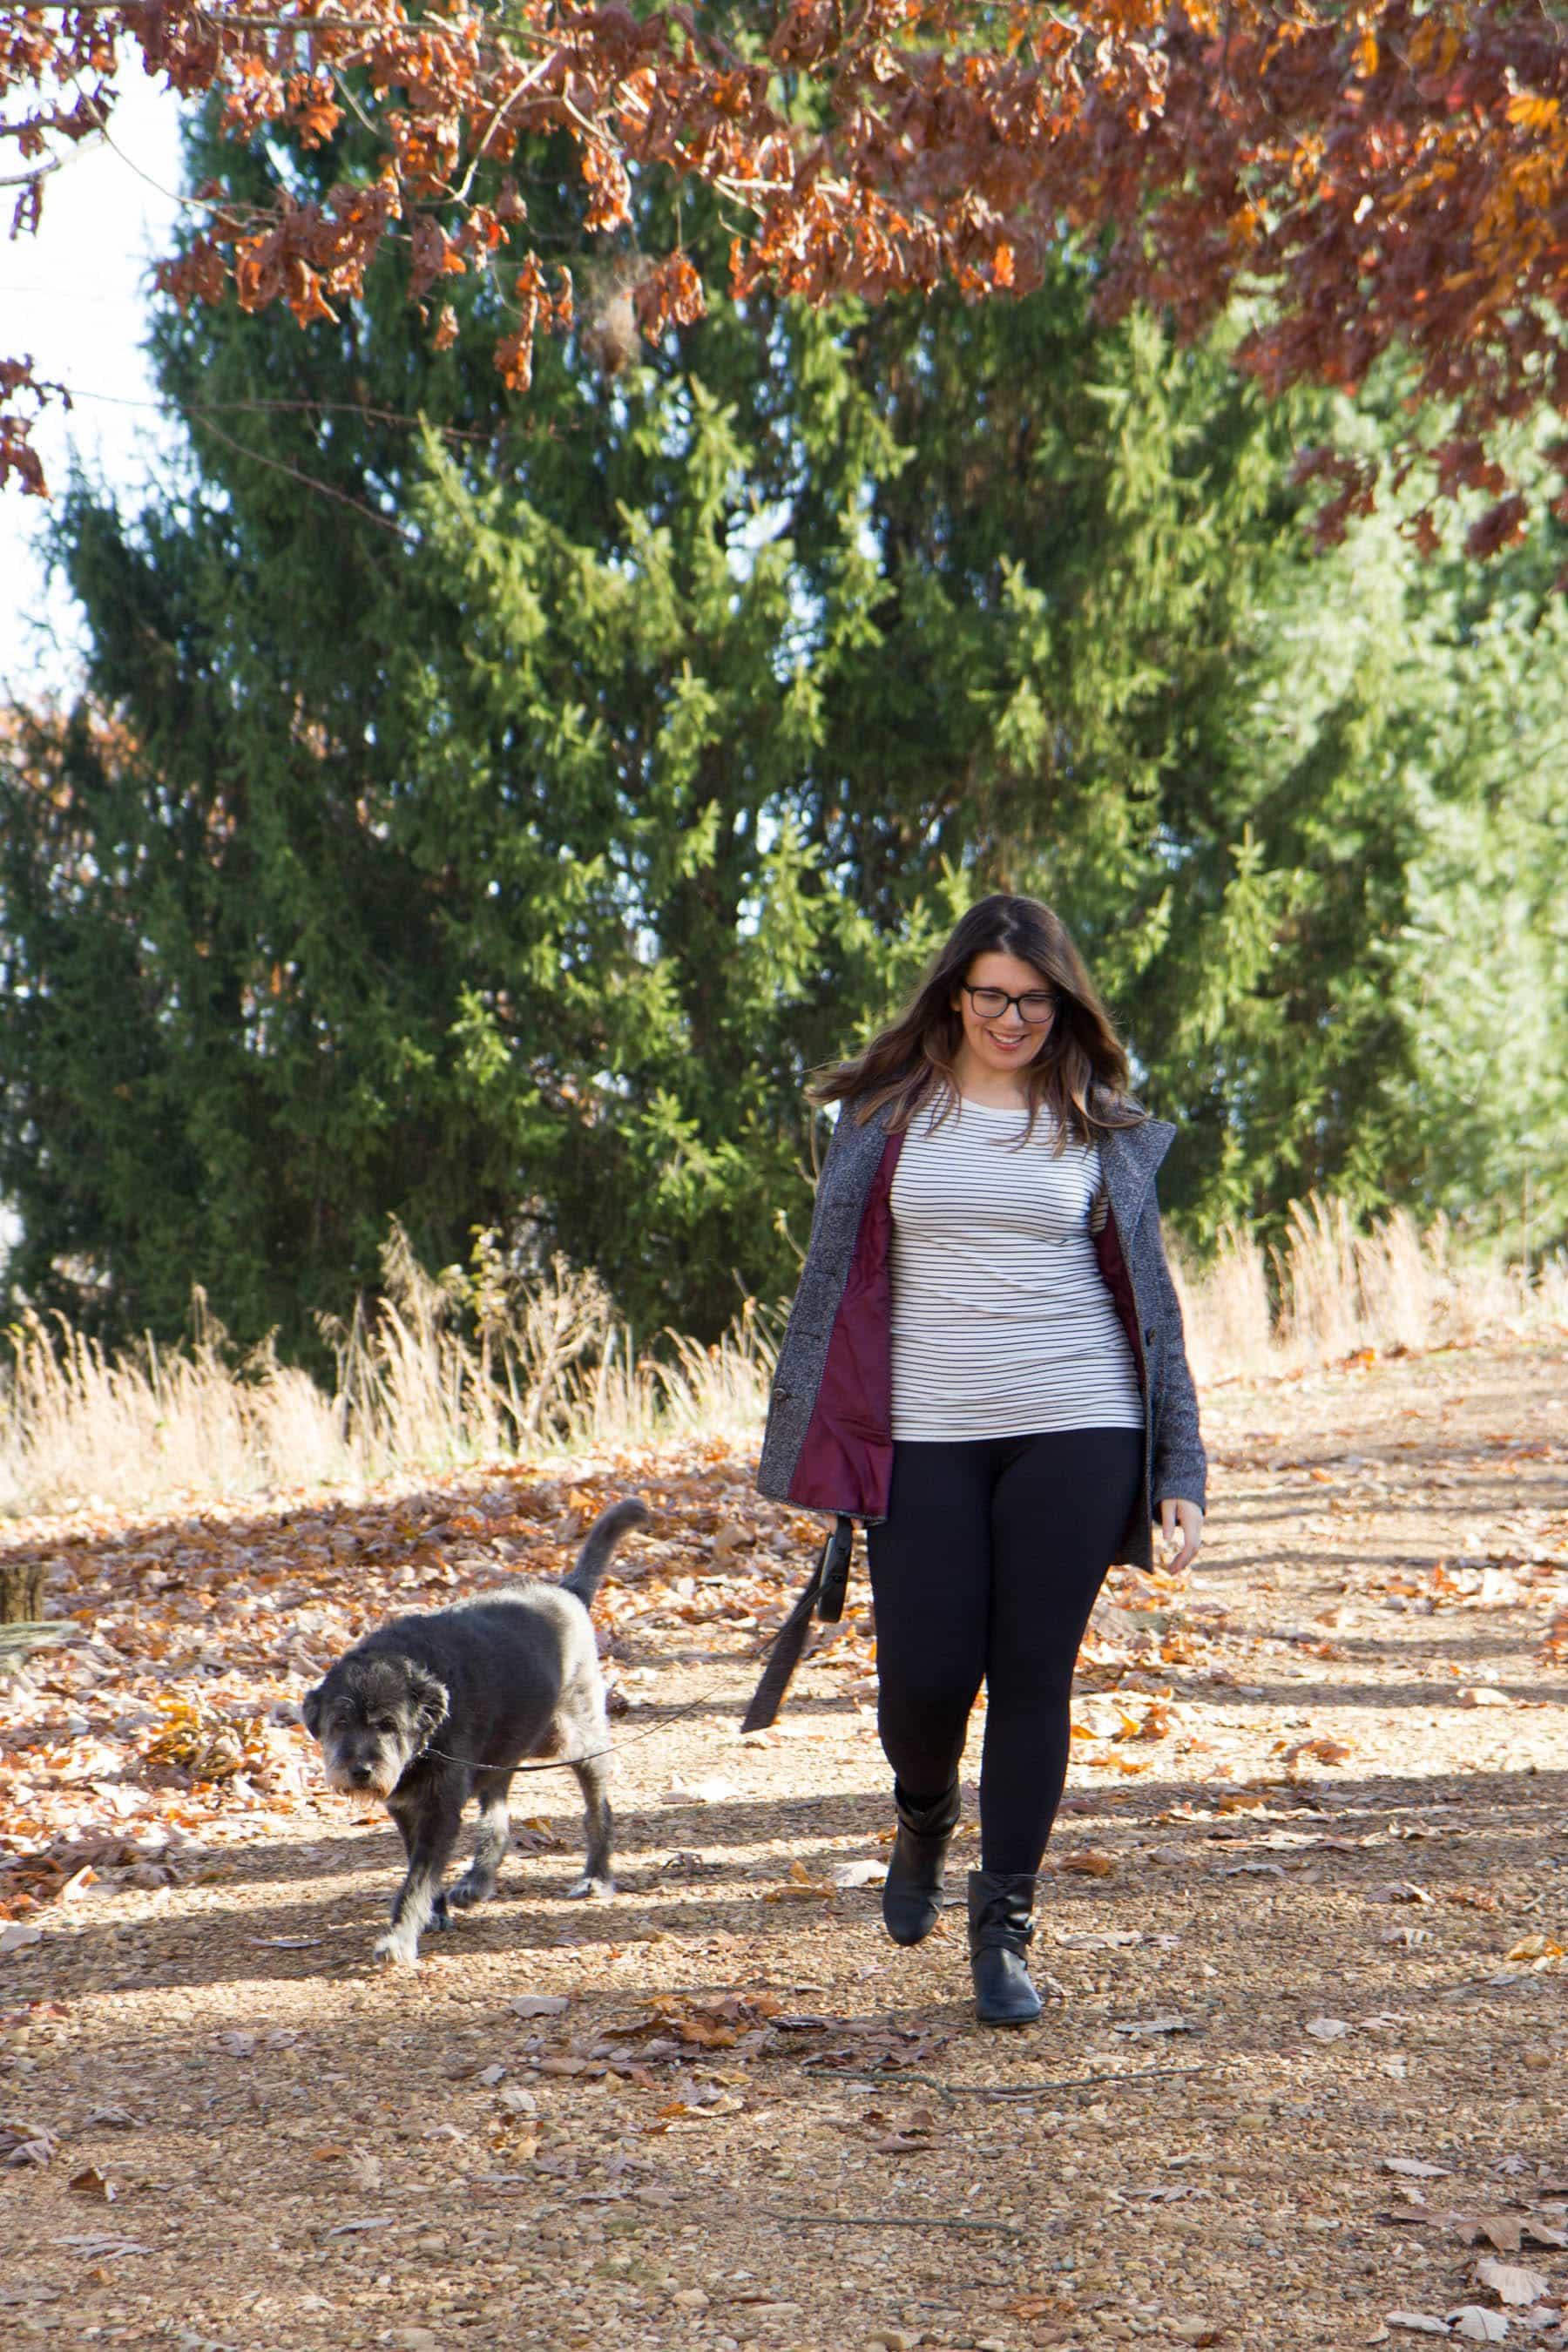 Brunette woman wearing layers walks a grey dog outside.